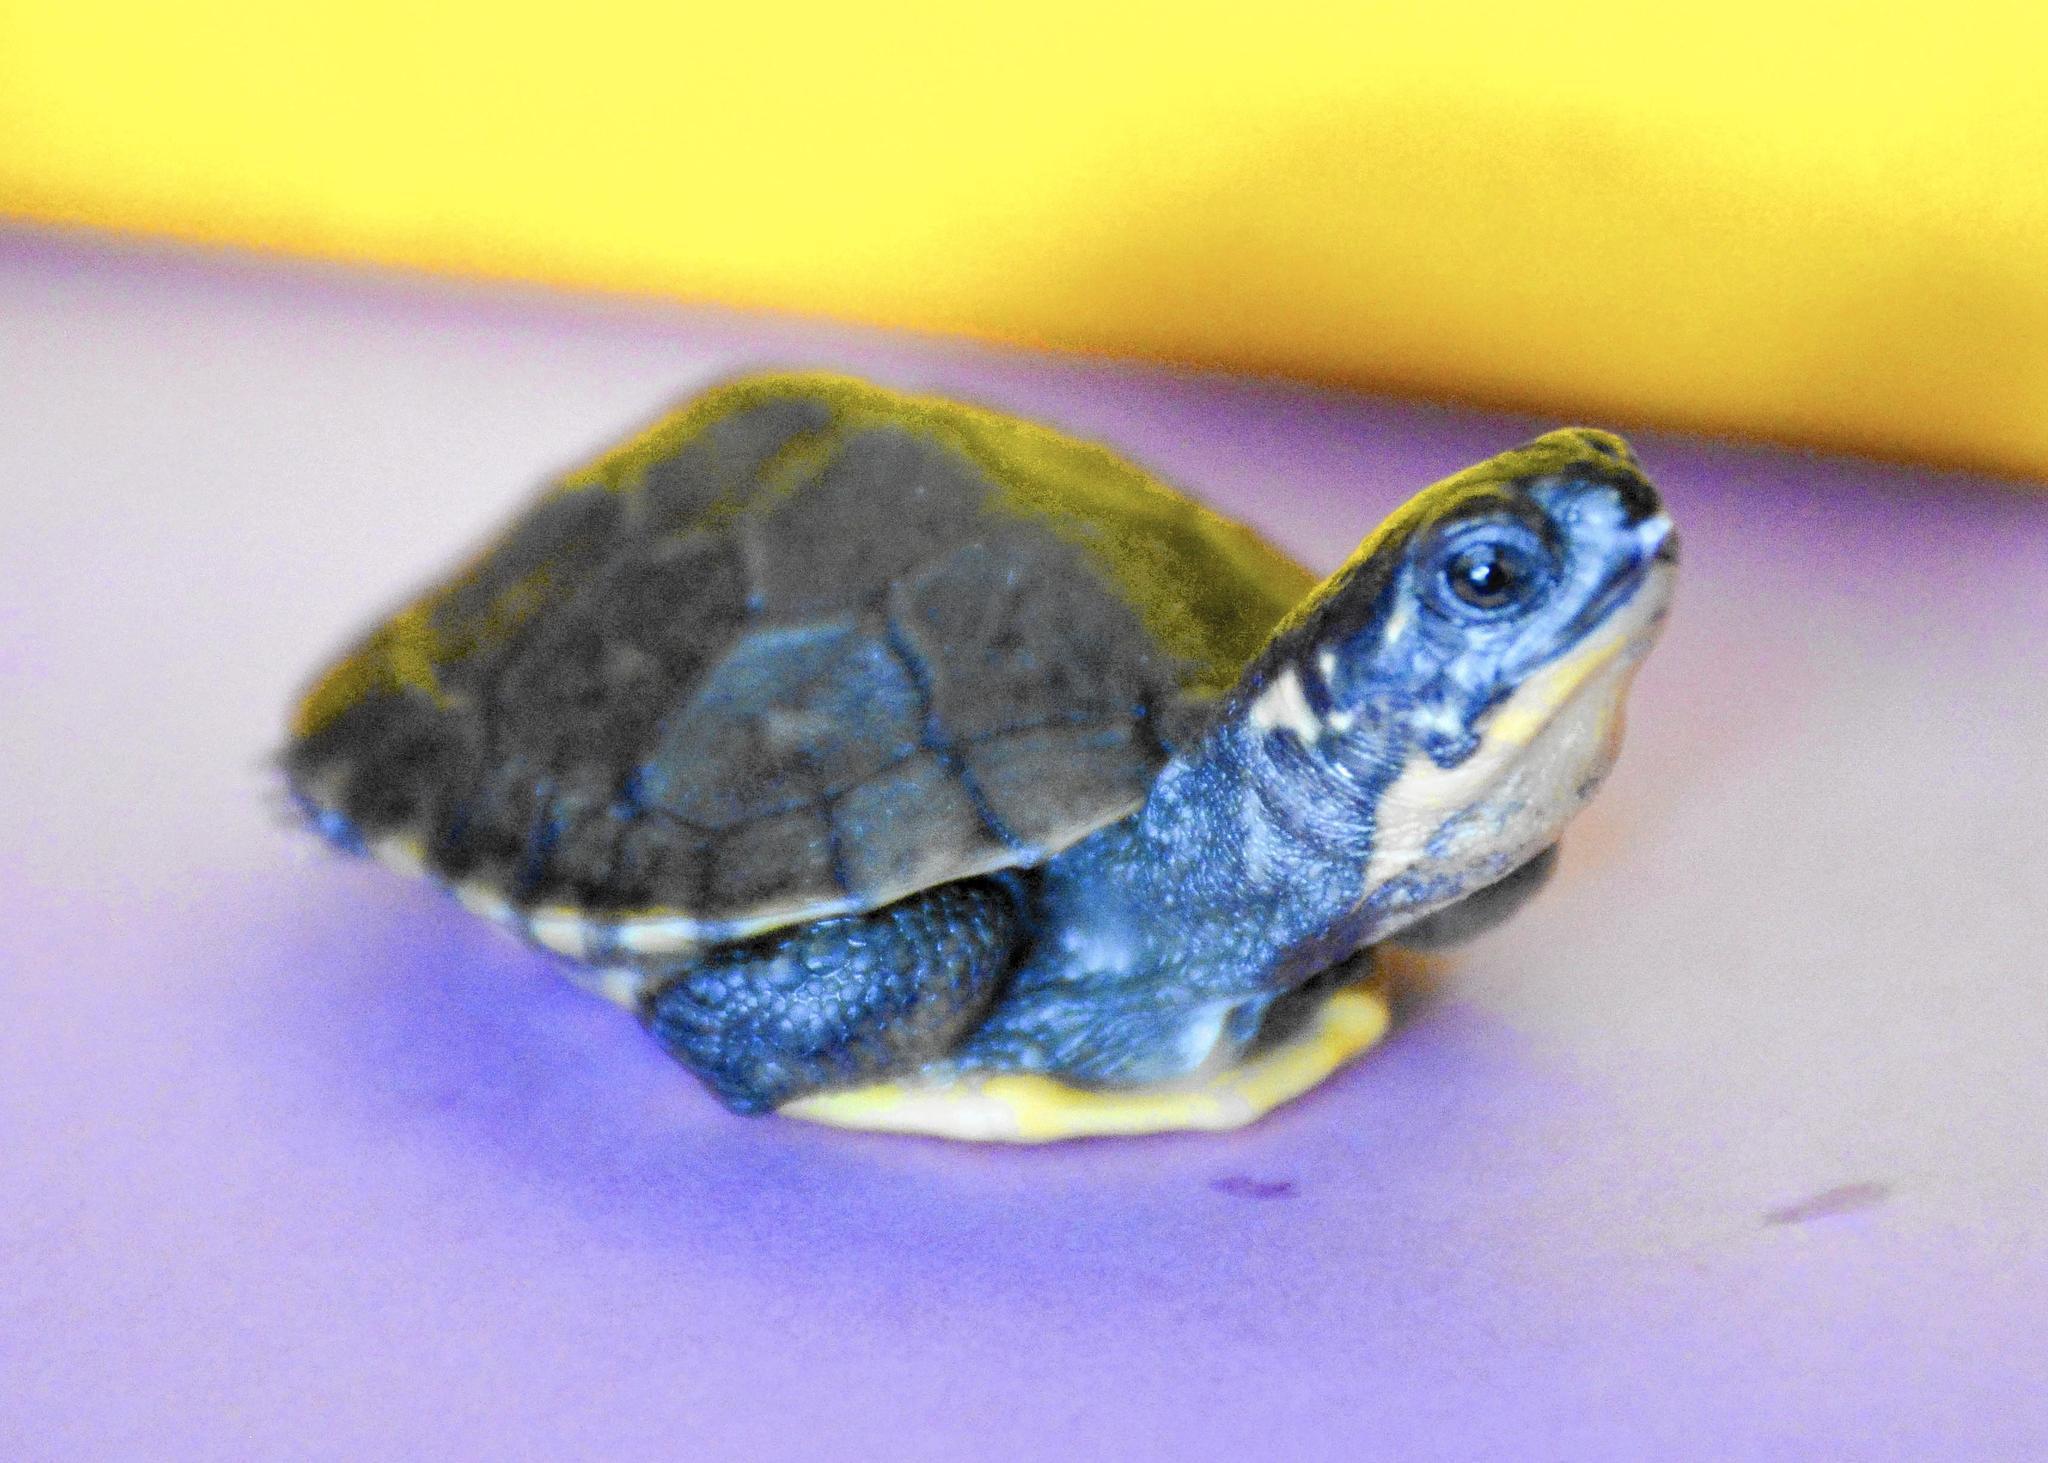 shell game adoption program aims to protect kane county turtles